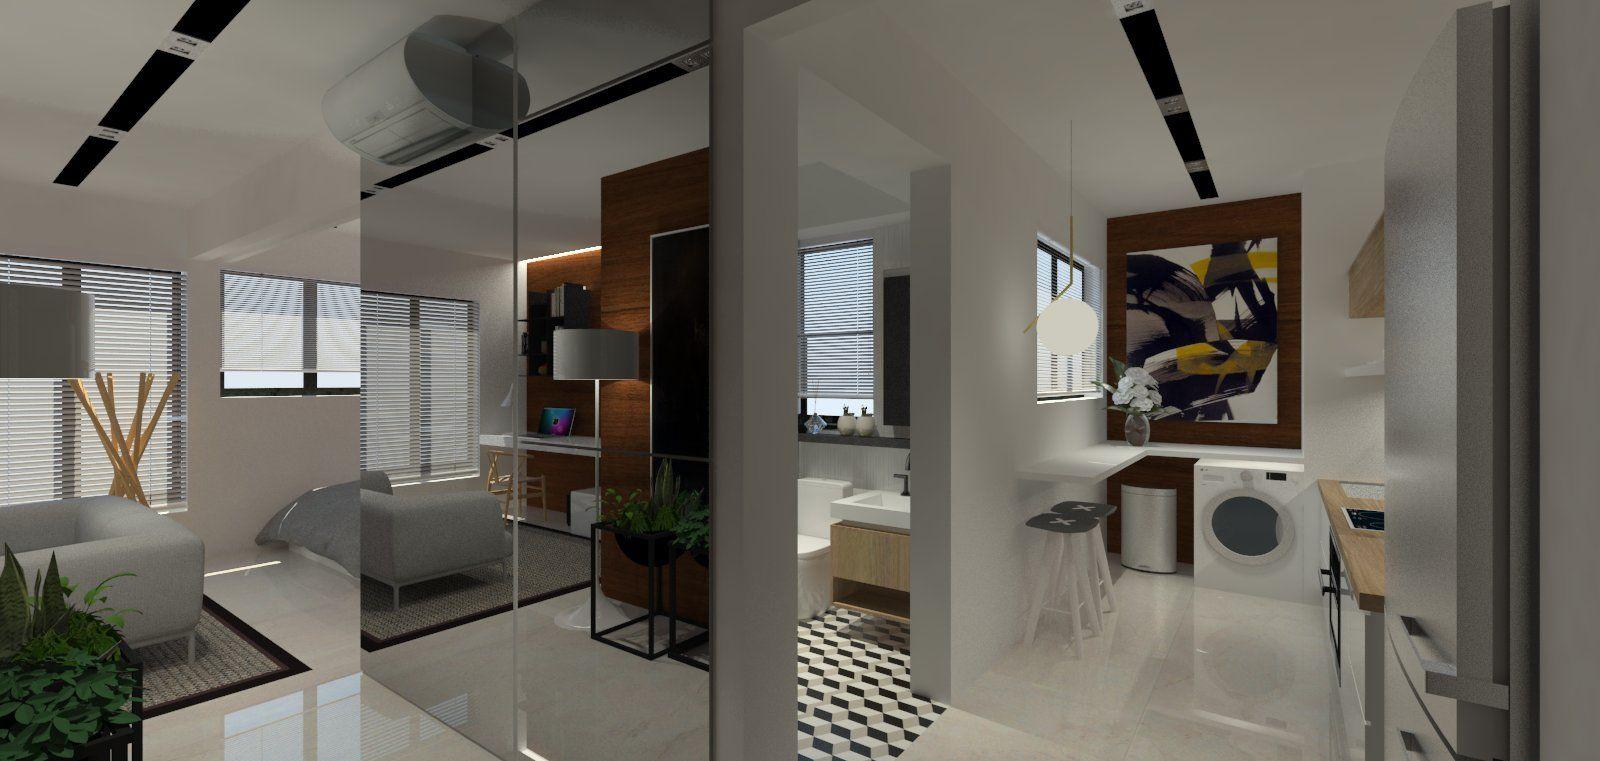 HDB 2 Room BTO for singles. 47sqm apartment interior ...